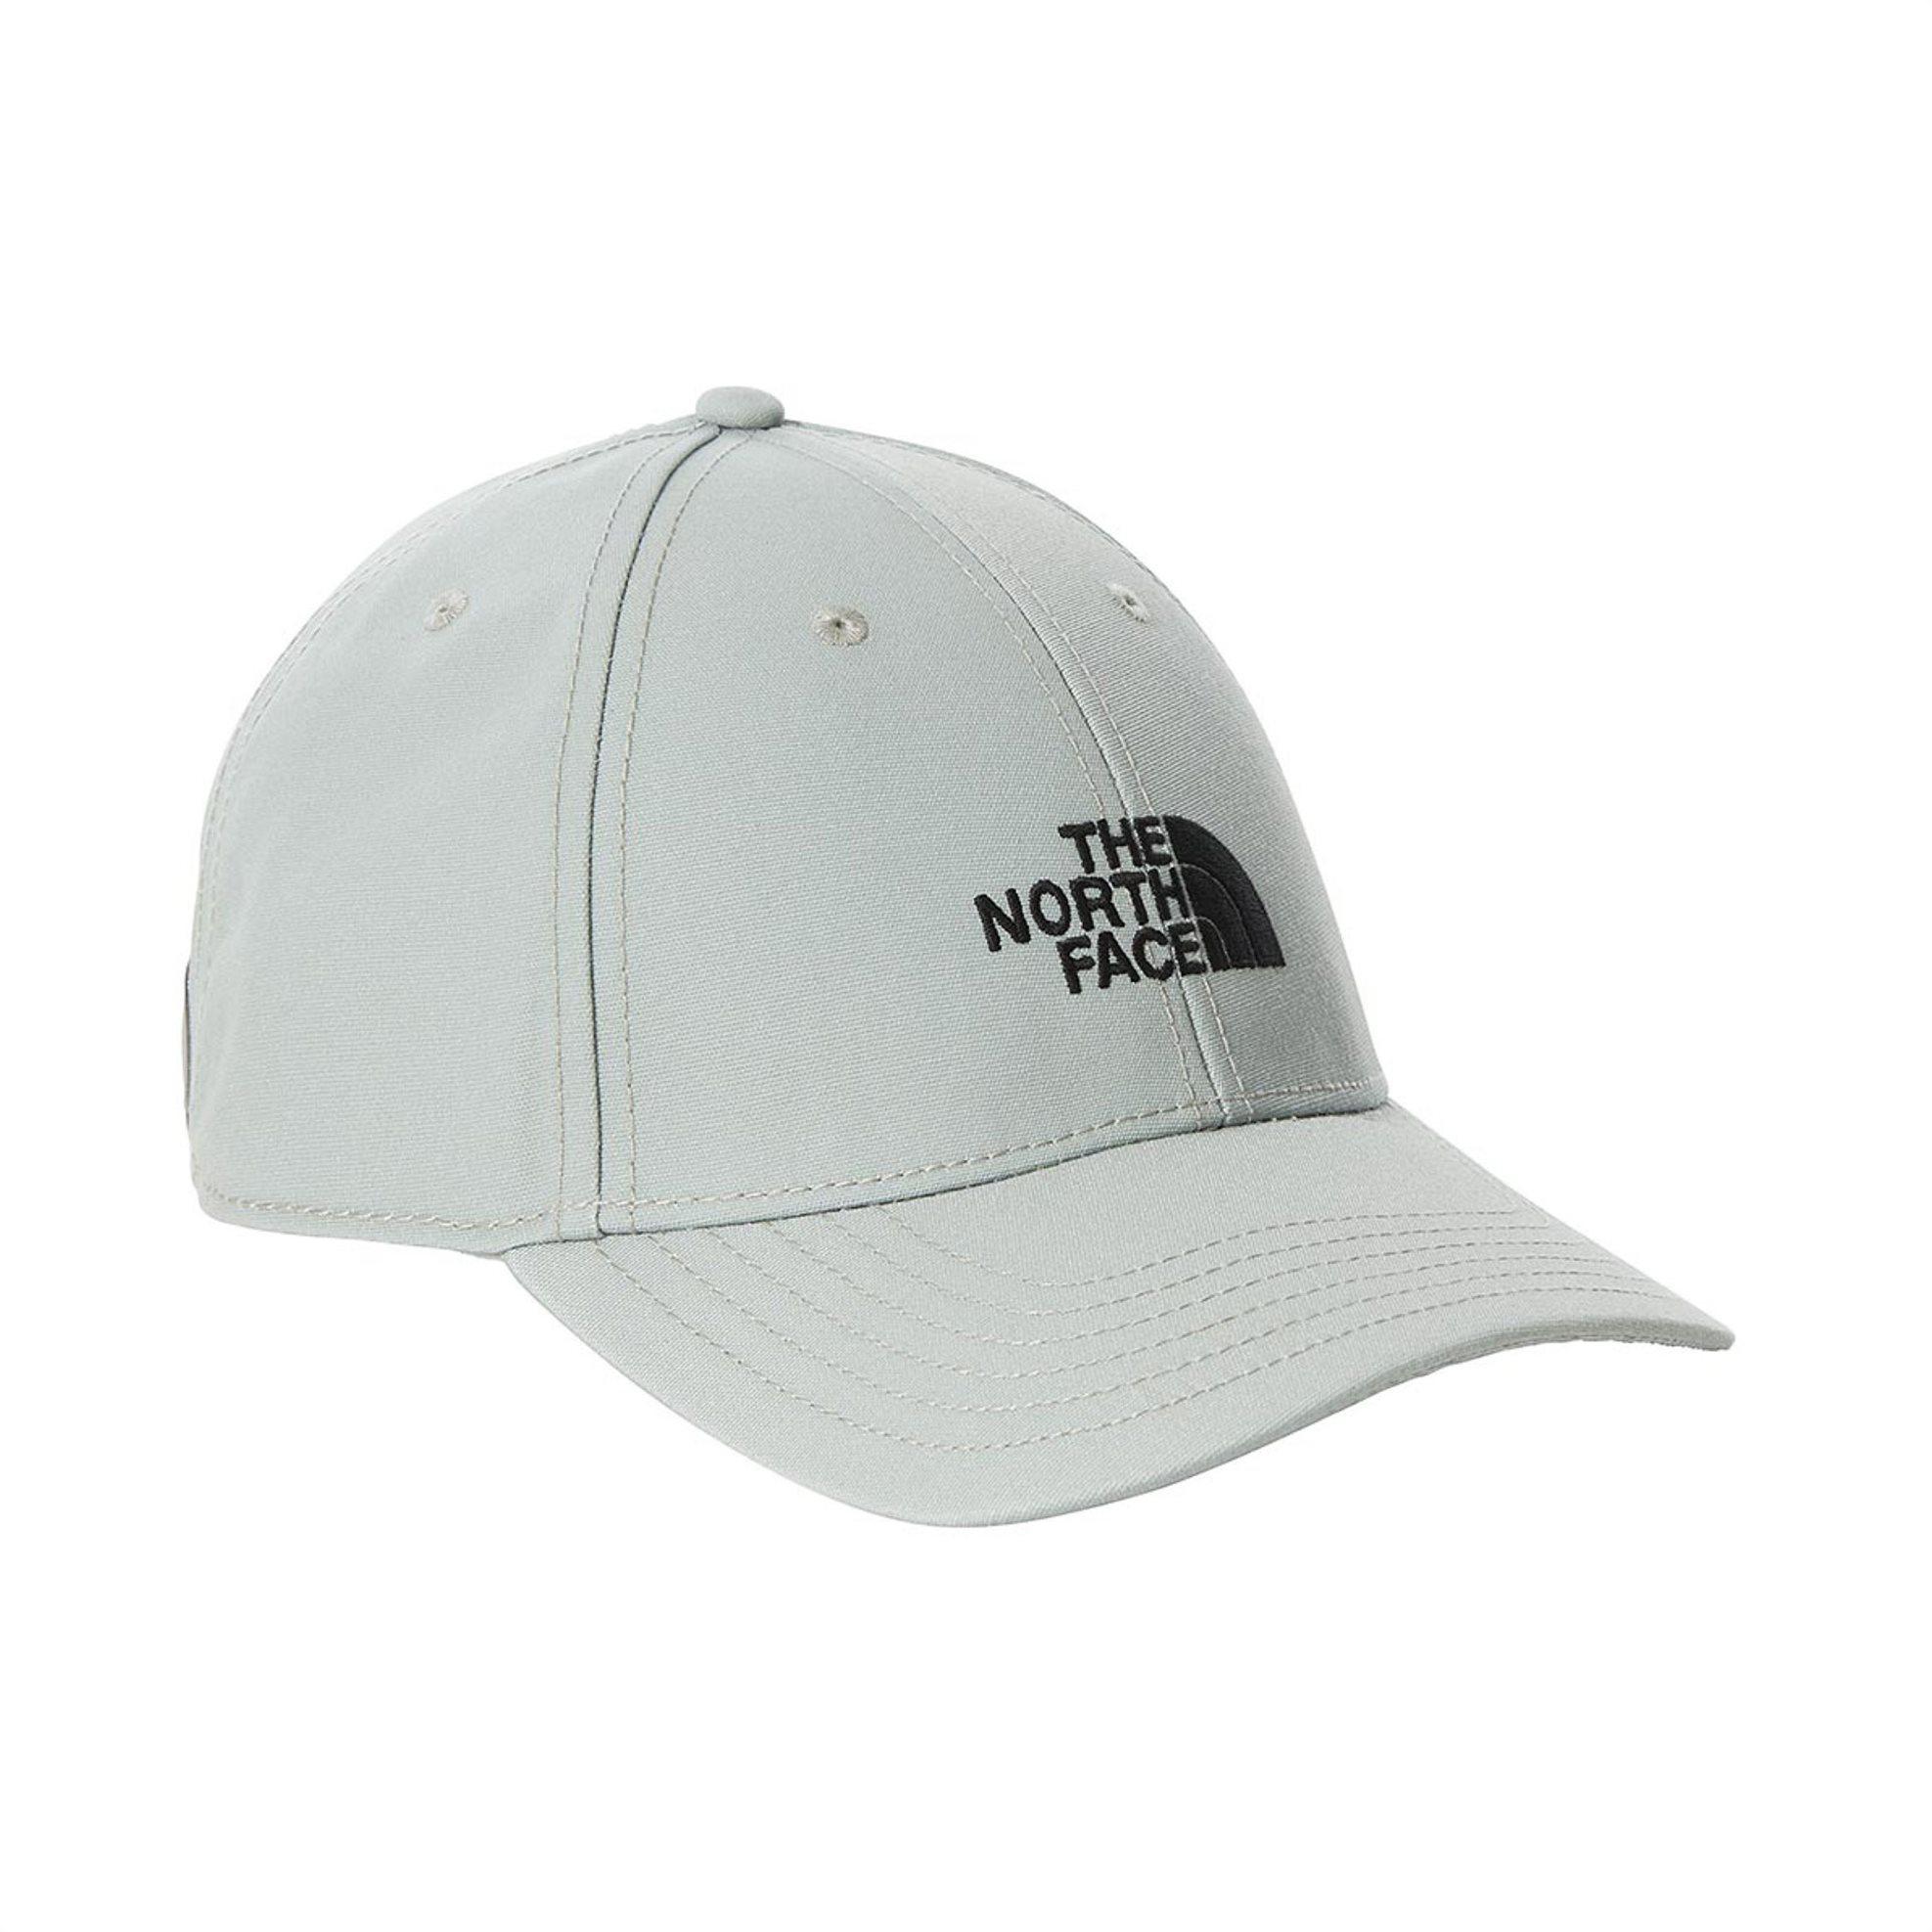 The North Face unisex καπέλο ''66 Classic'' - NF0A4VSVHDF1 - Γκρι